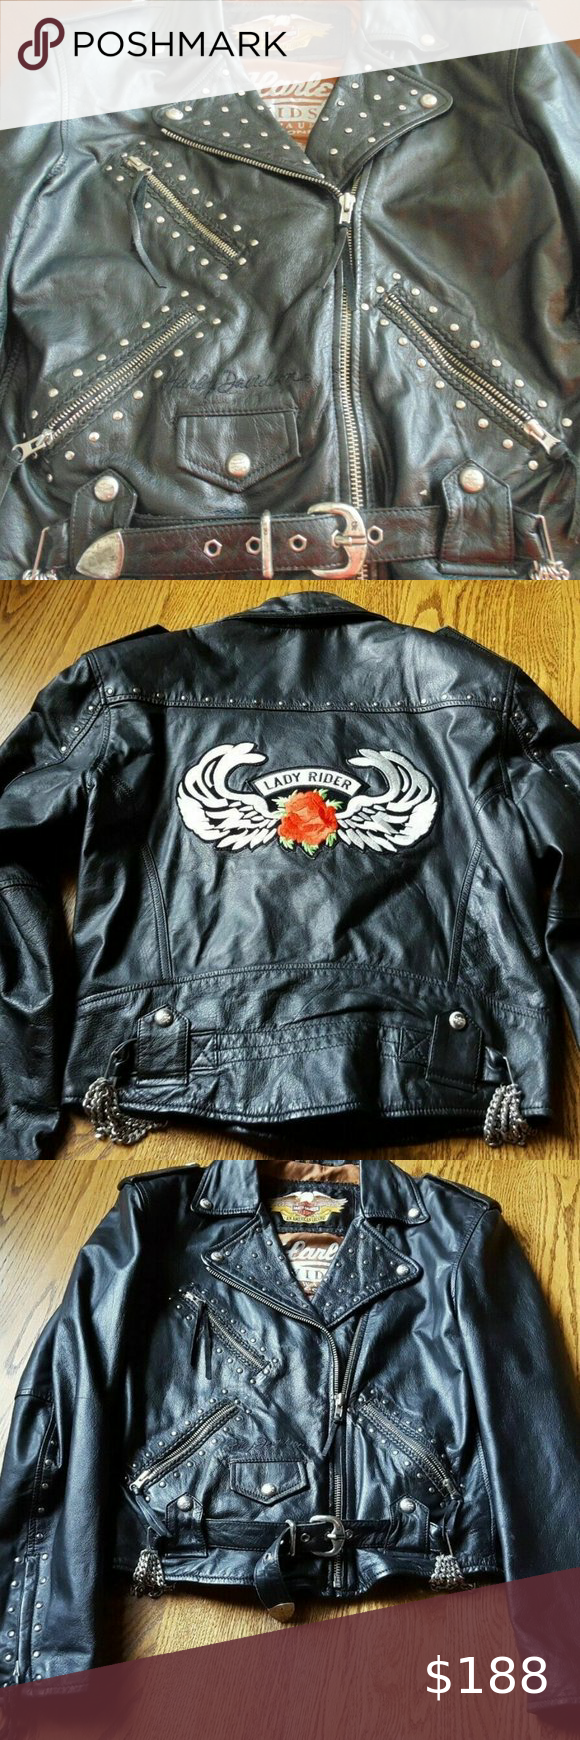 Harley Davidson Lady Rider Studded Leather Jacket Studded Leather Jacket Studded Leather Clothes Design [ 1740 x 580 Pixel ]